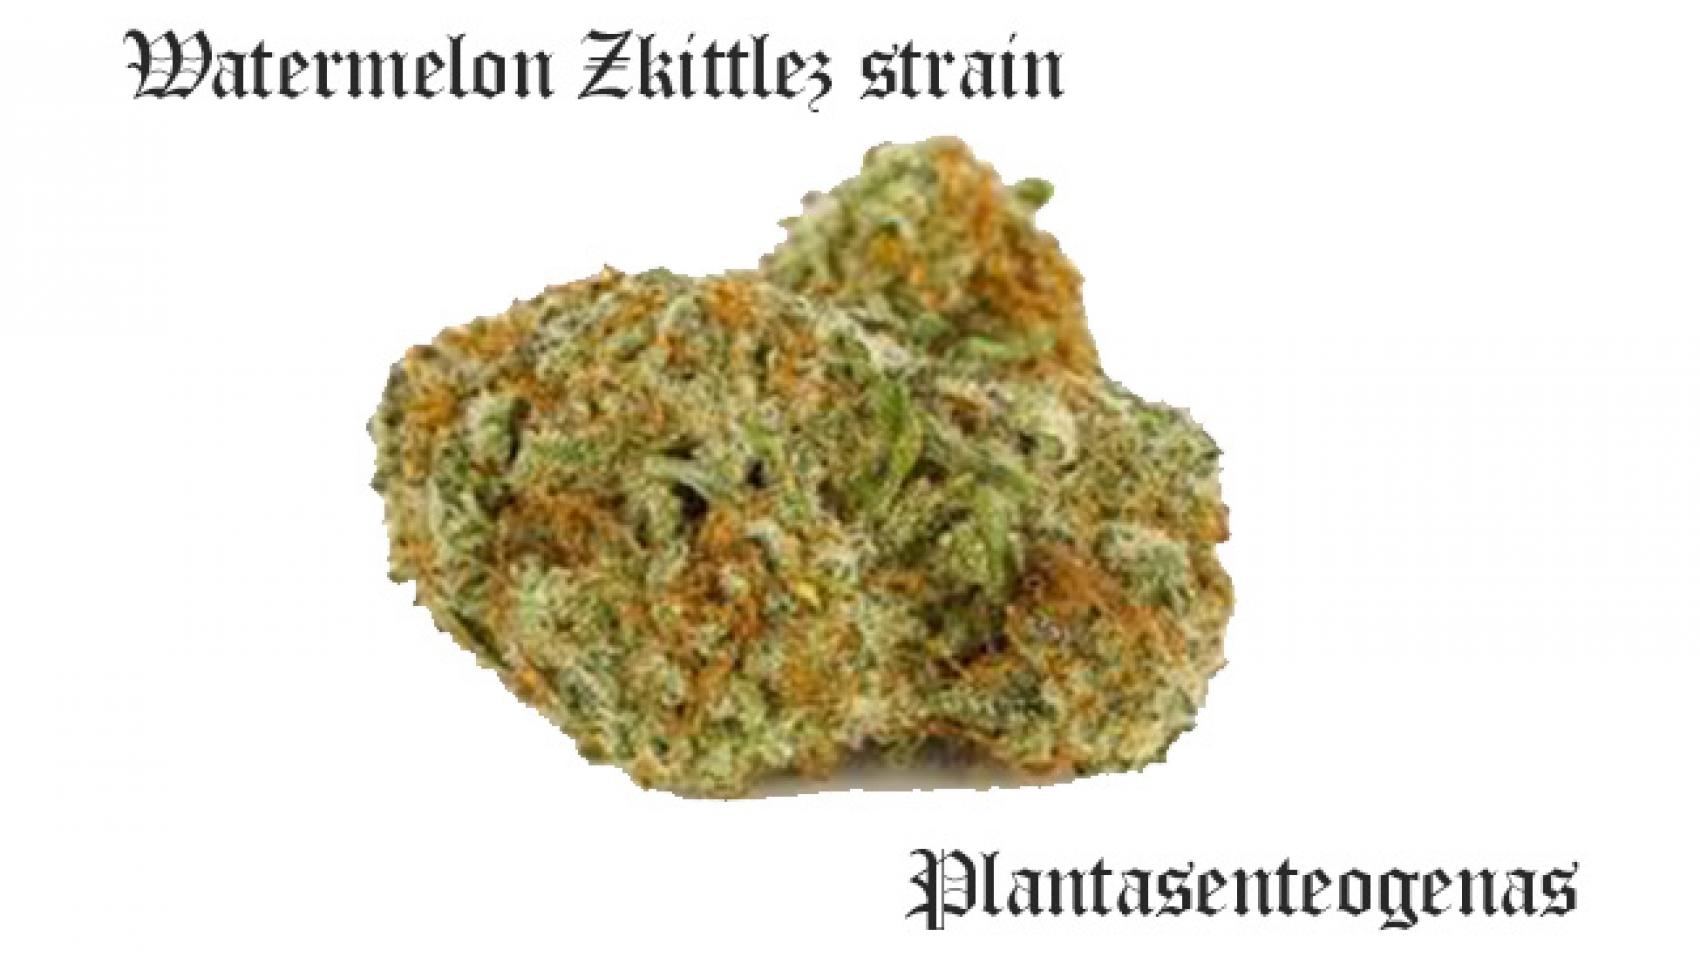 Watermelon Zkittlez strain